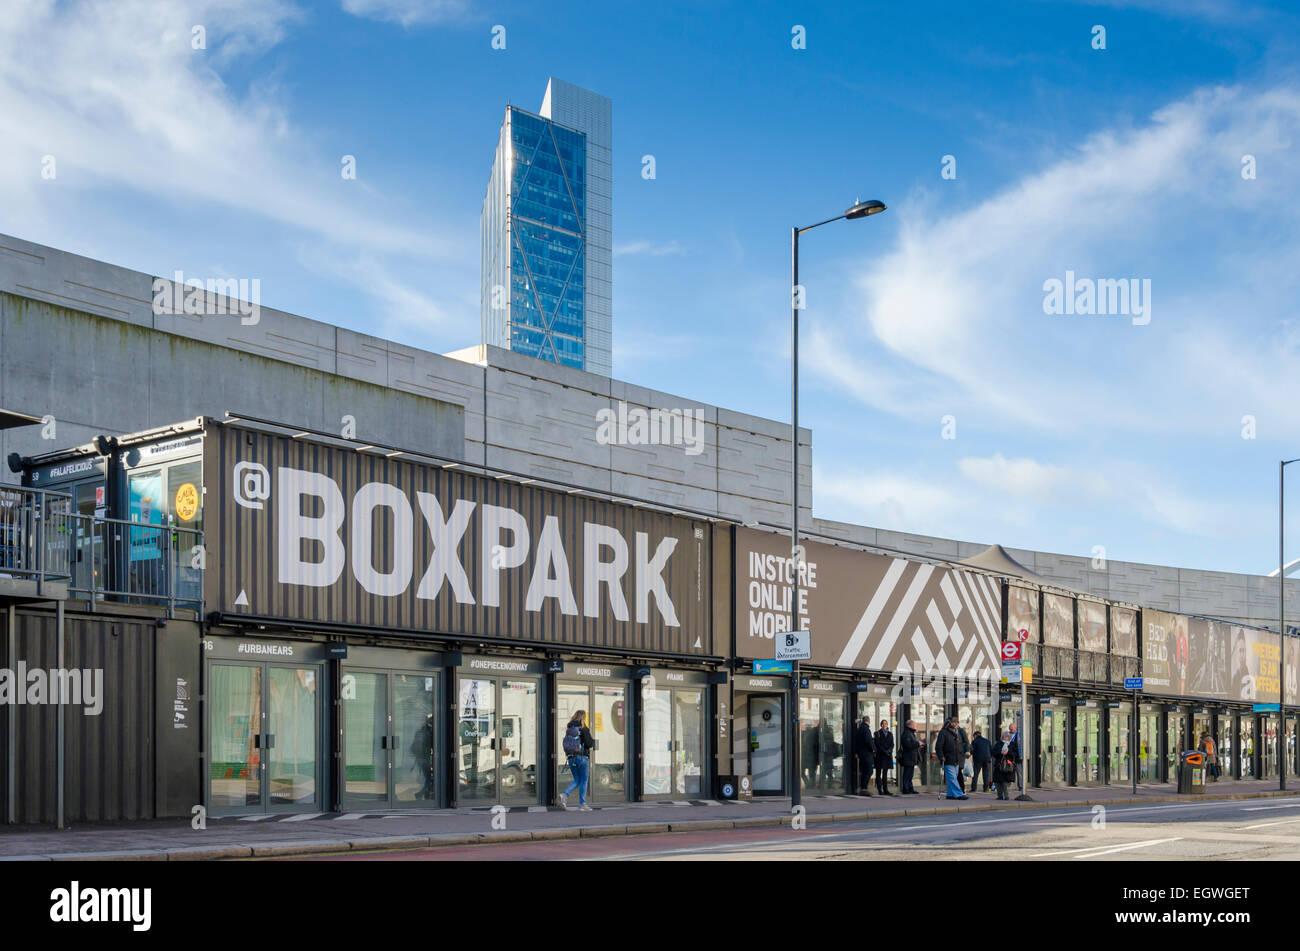 Boxpark, East London, Reino Unido Imagen De Stock